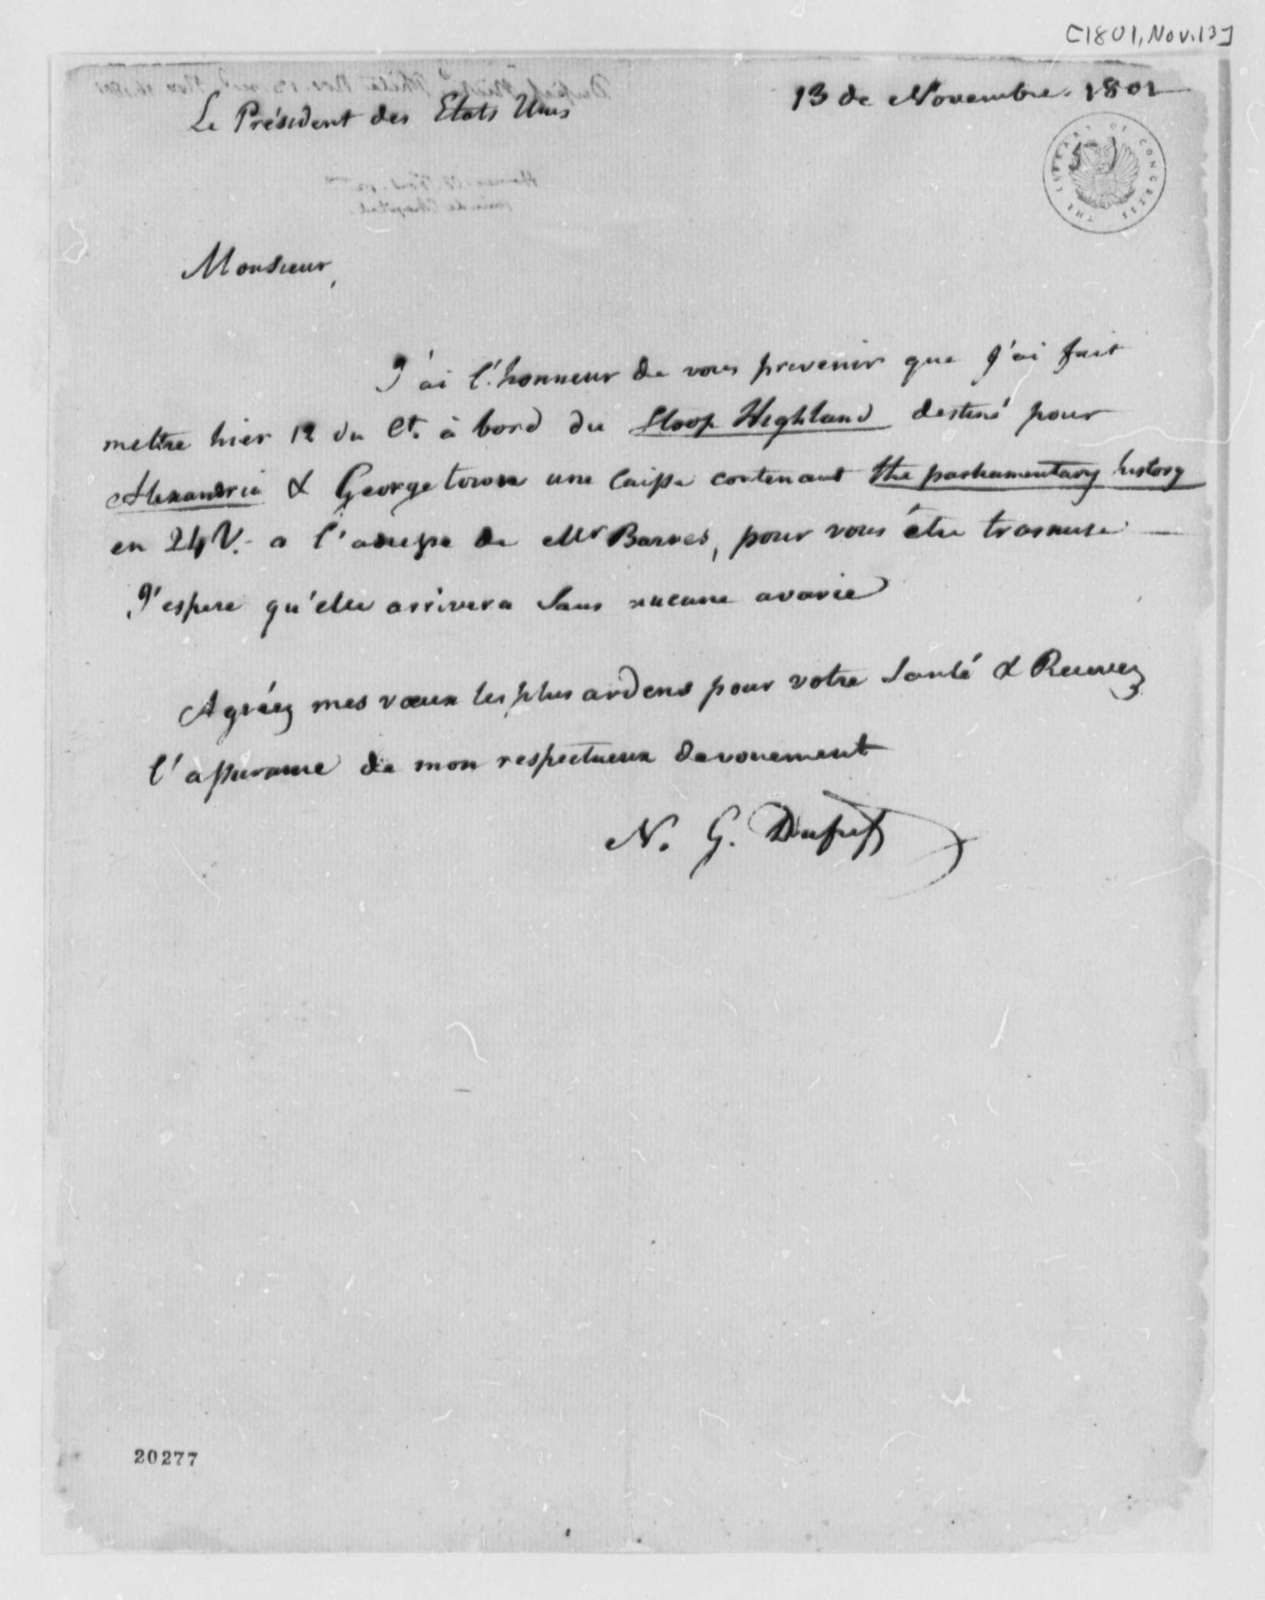 Nicholas Gouin Dufief to Thomas Jefferson, November 13, 1801, in French